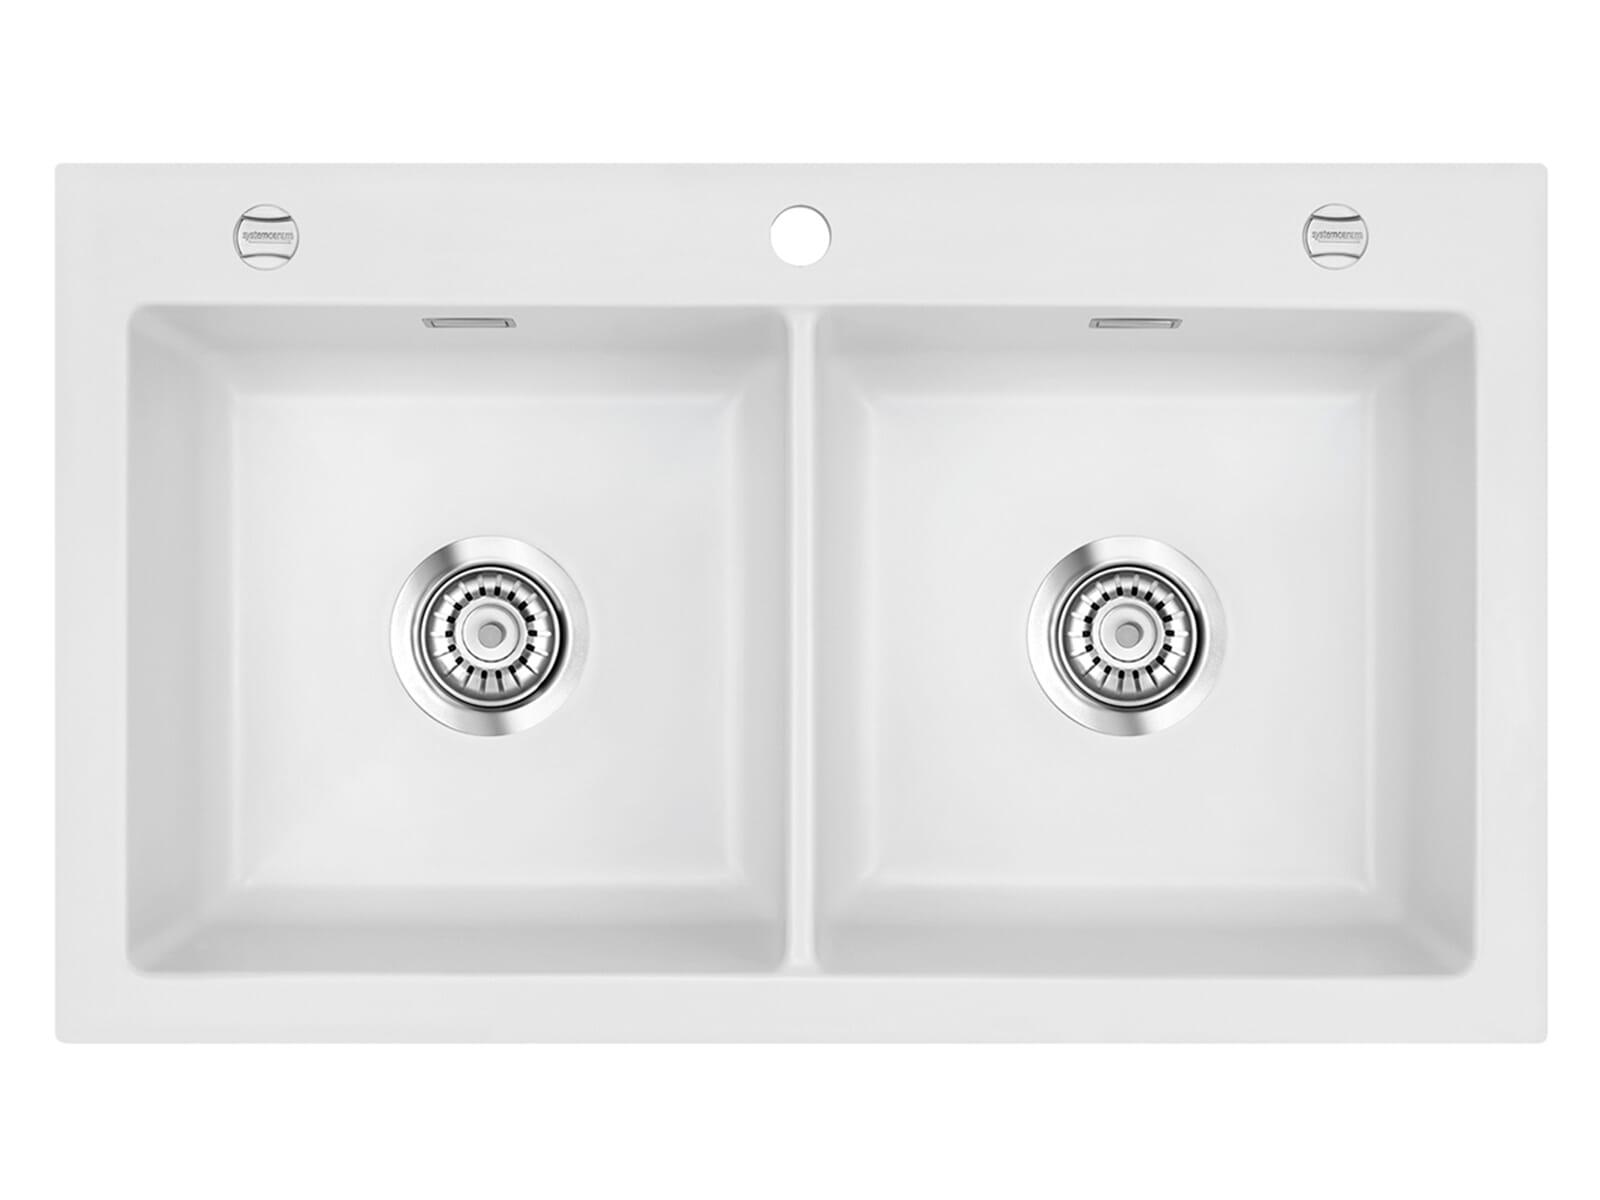 Systemceram Mera Twin Satin Keramikspüle Excenterbetätigung